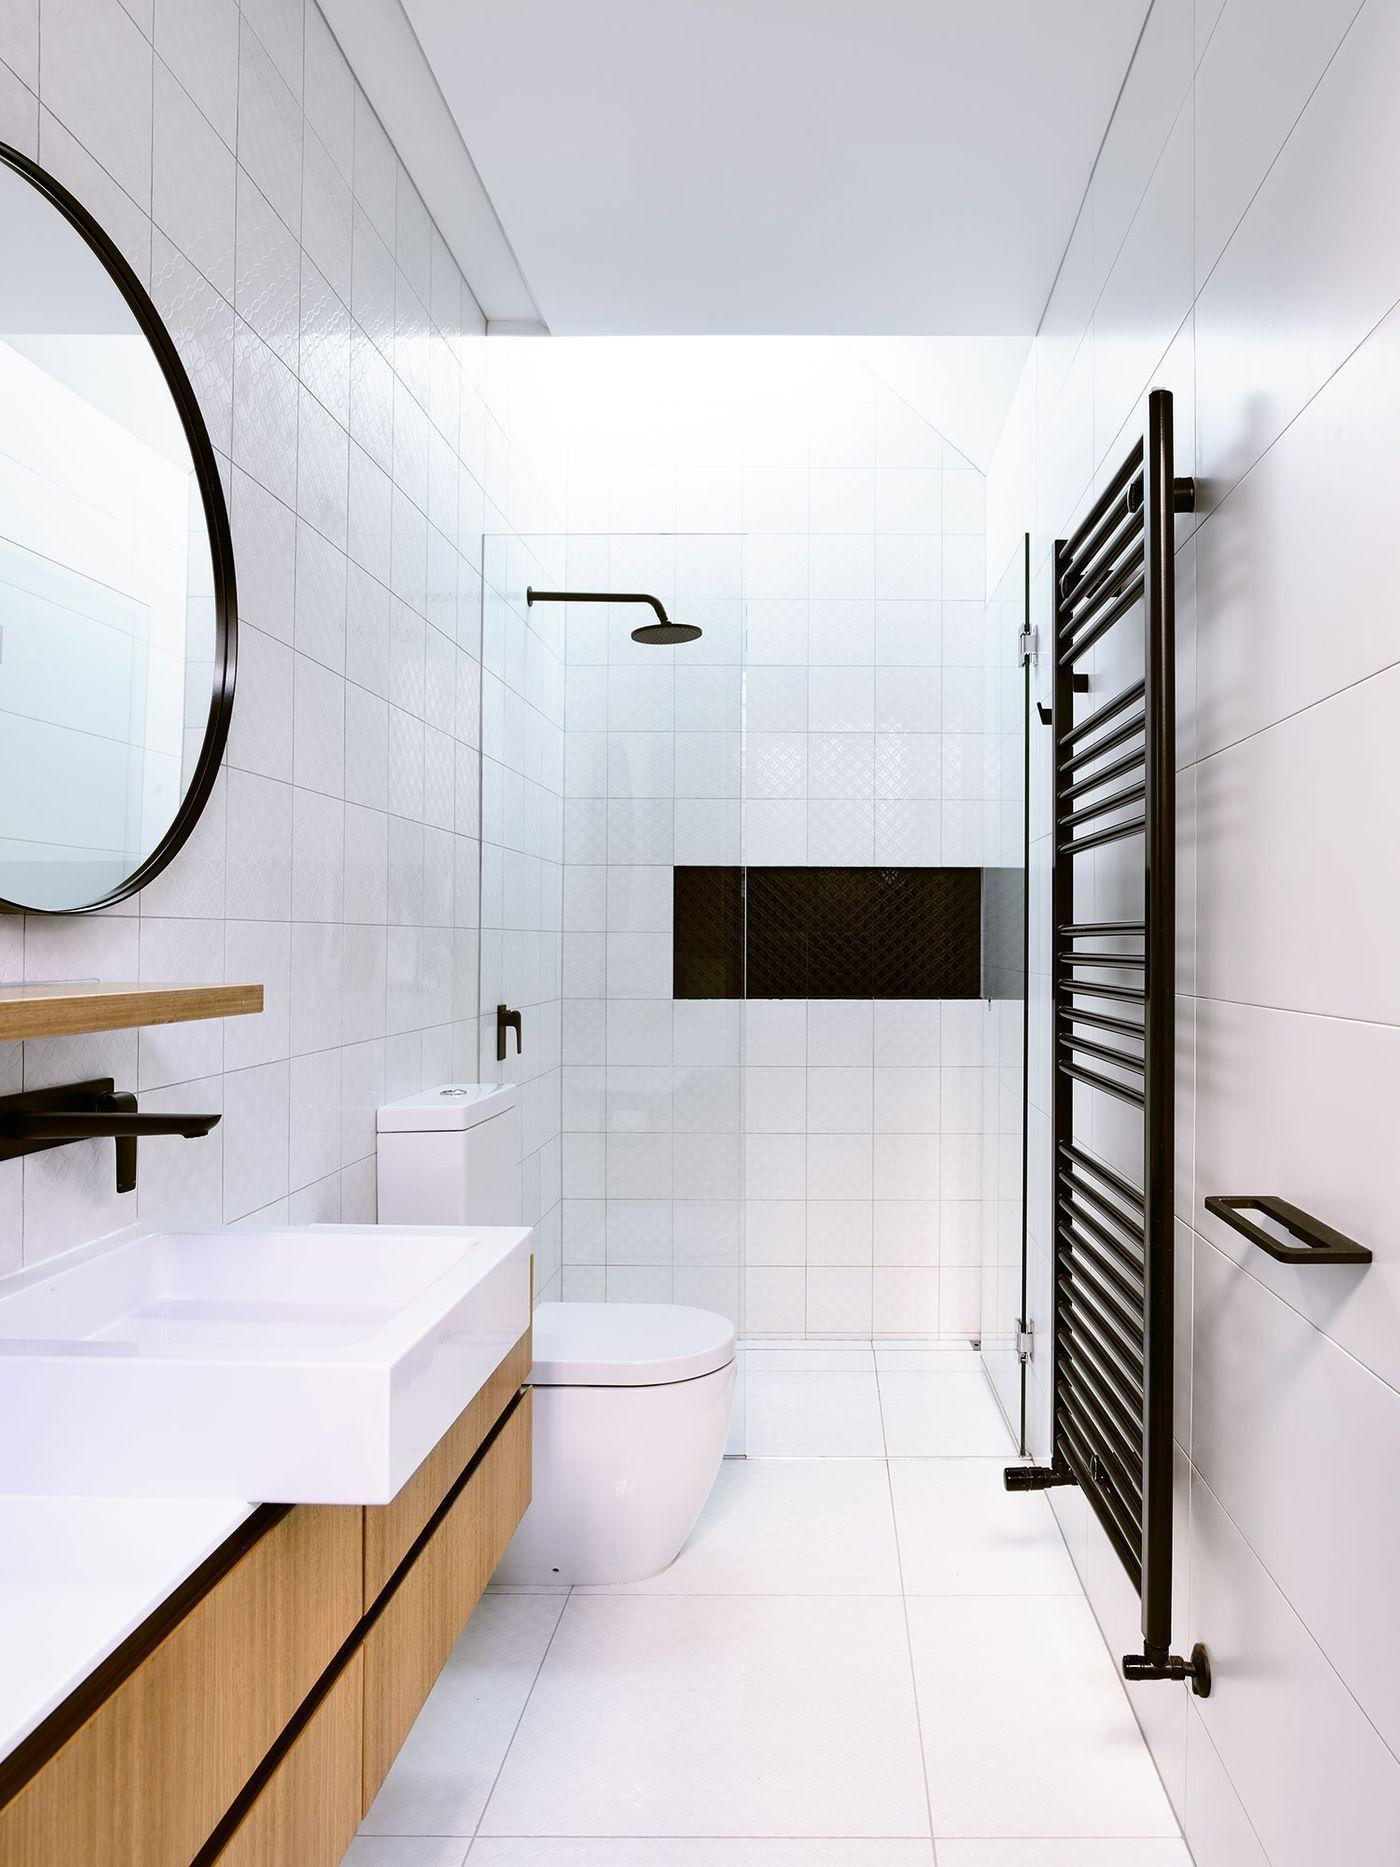 Bathroom Ideas Do S And Don Ts Of Bathroom Design Realestate Com Au Bathroom Shower Design Modern Bathroom Bathroom Windows